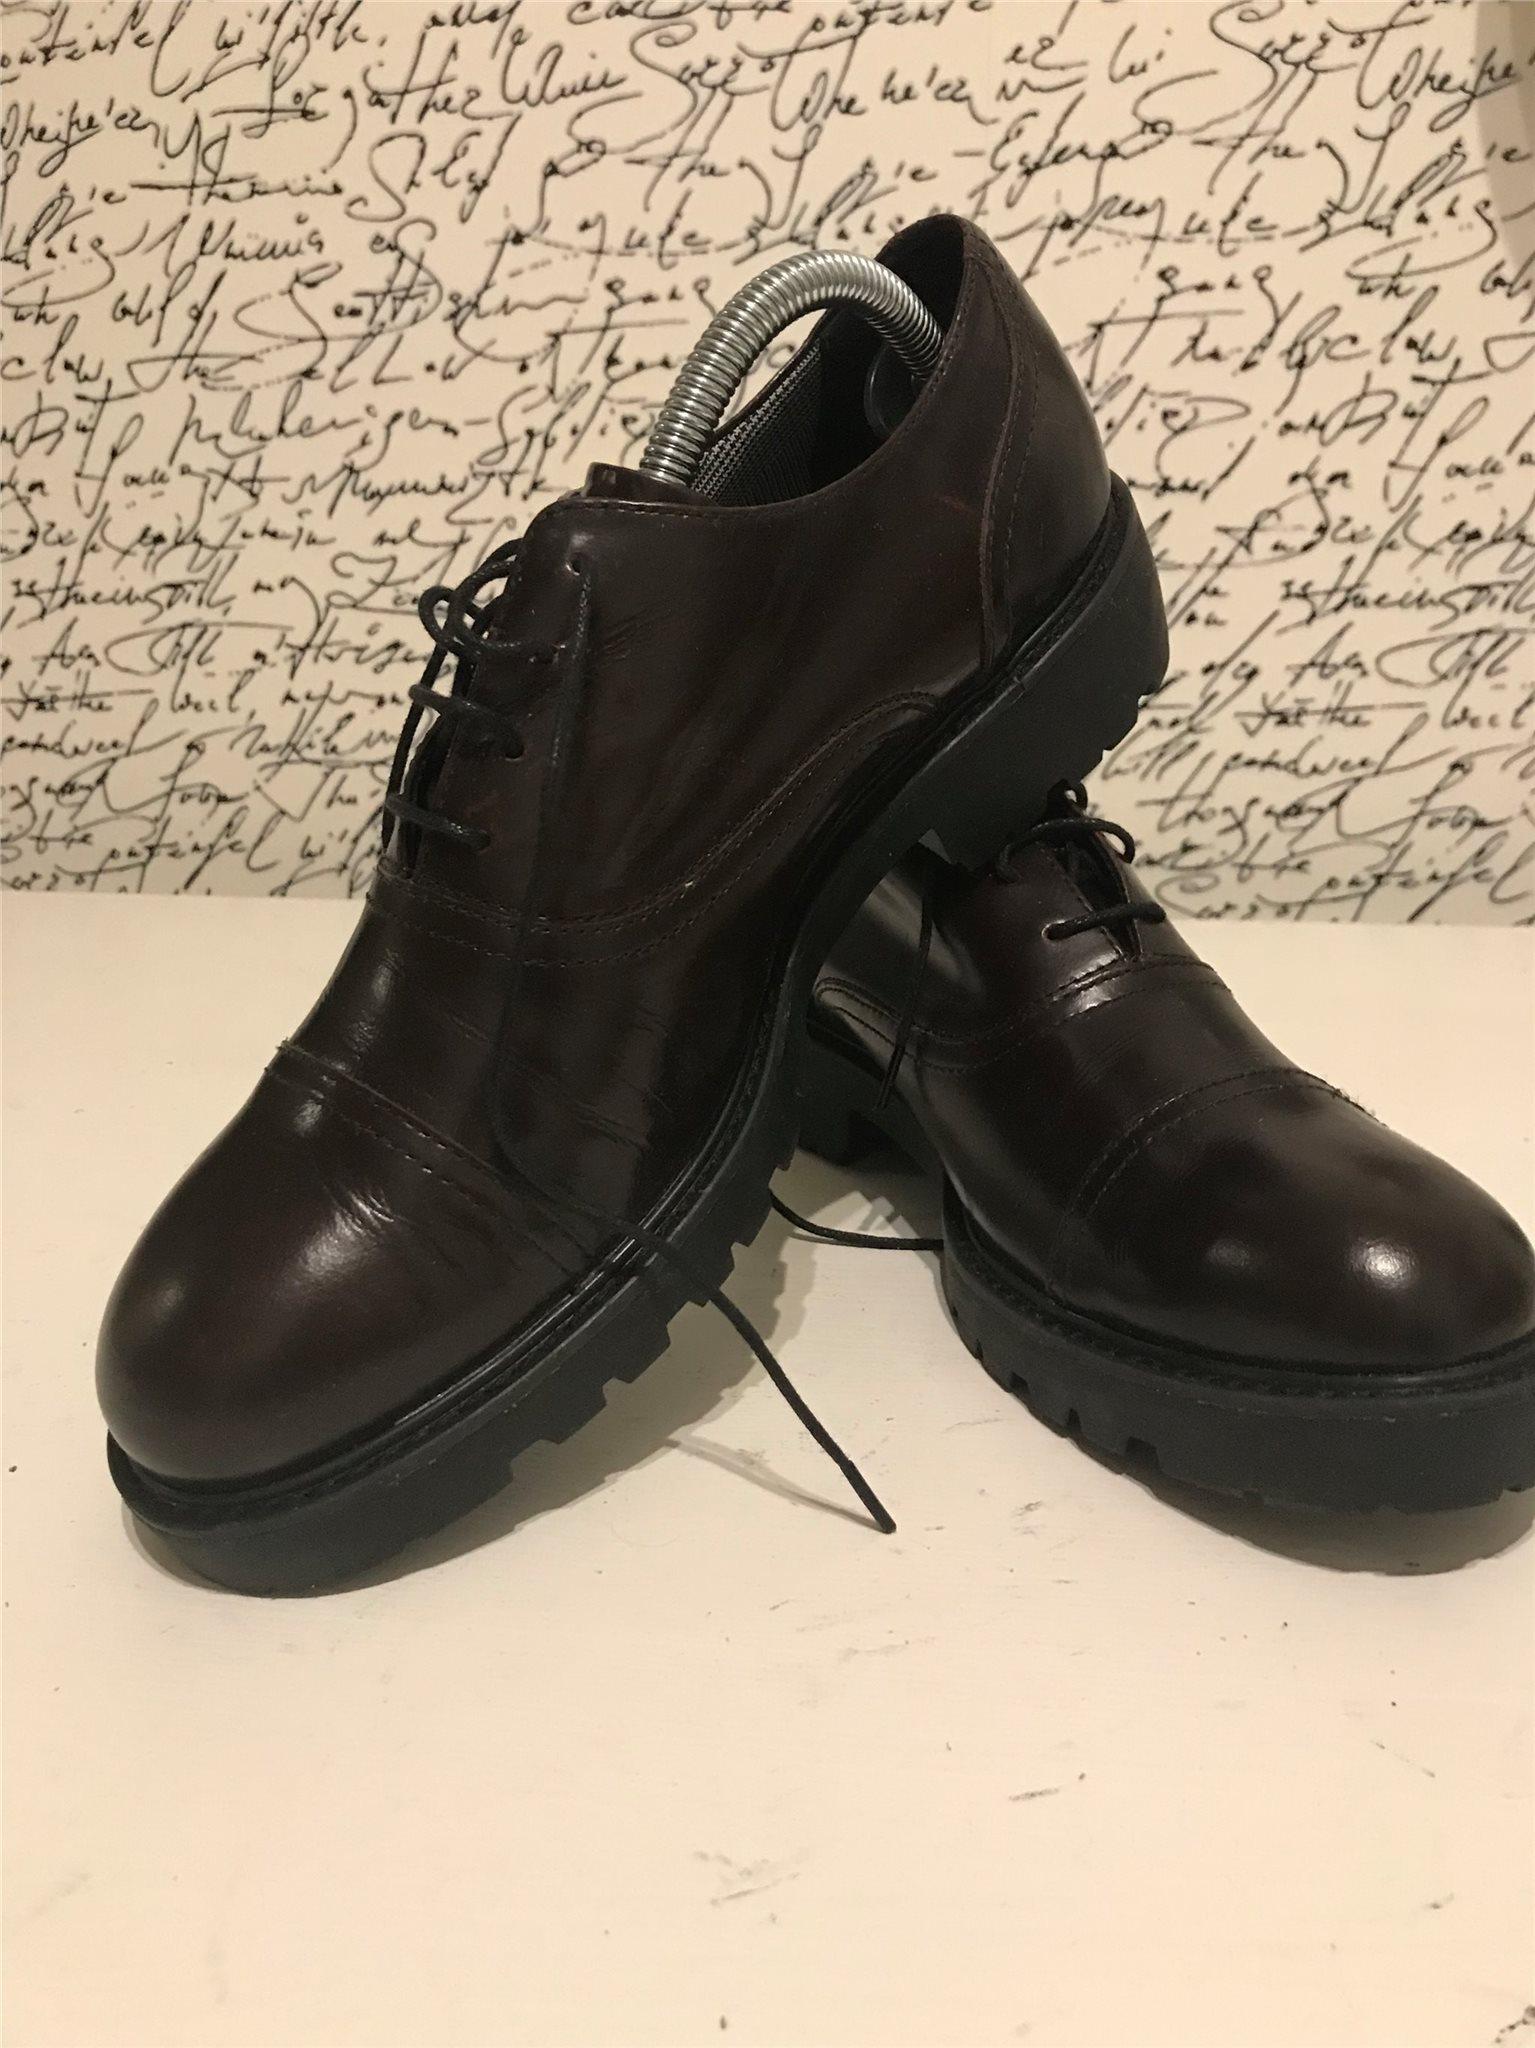 Vagabond skinn skor i stl 41. Mycket fint skick! (341635519) ᐈ Köp ... 3ec1b2fe8ac49